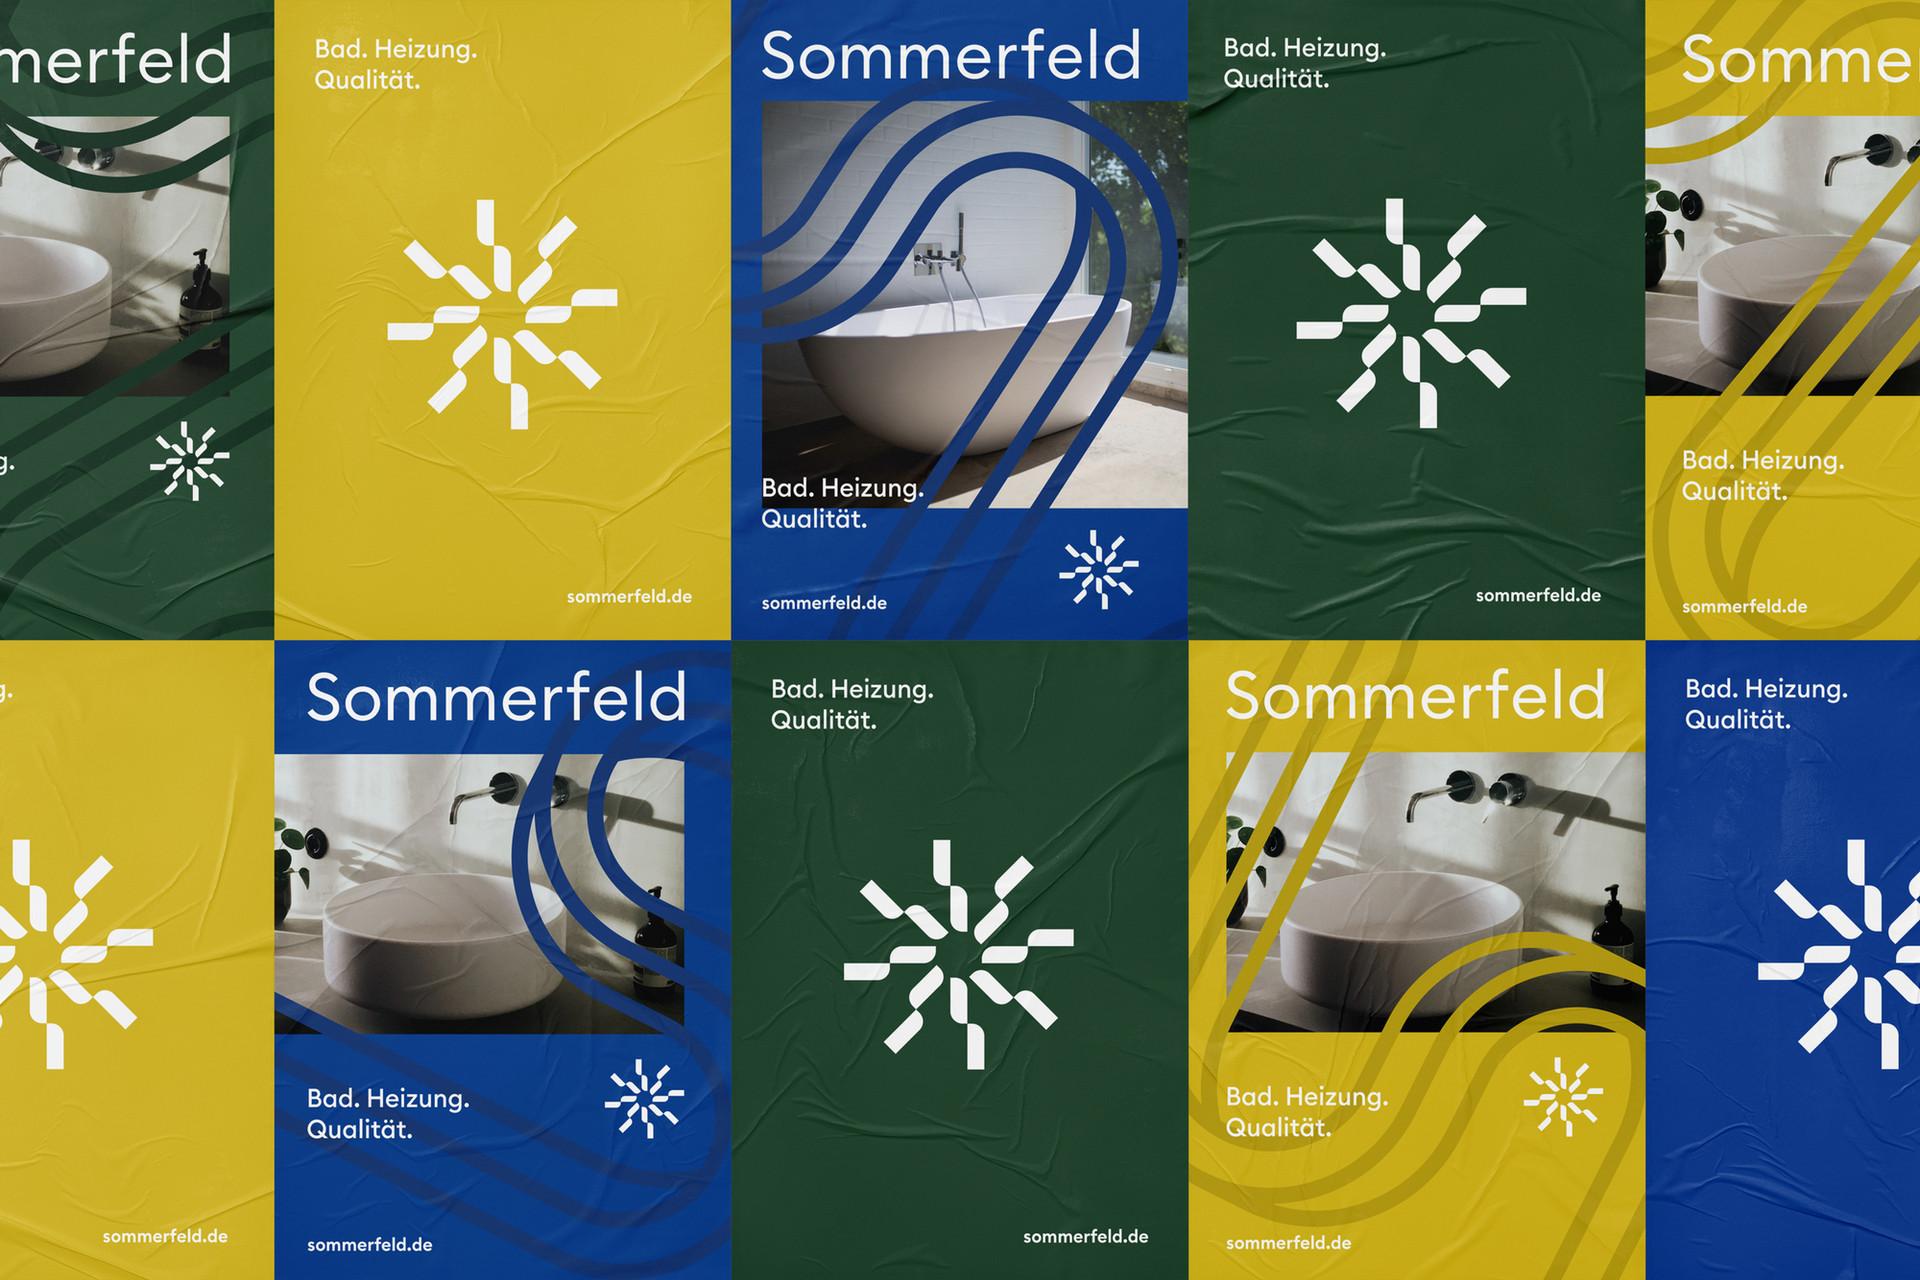 sl_Sommerfeld_17.jpg